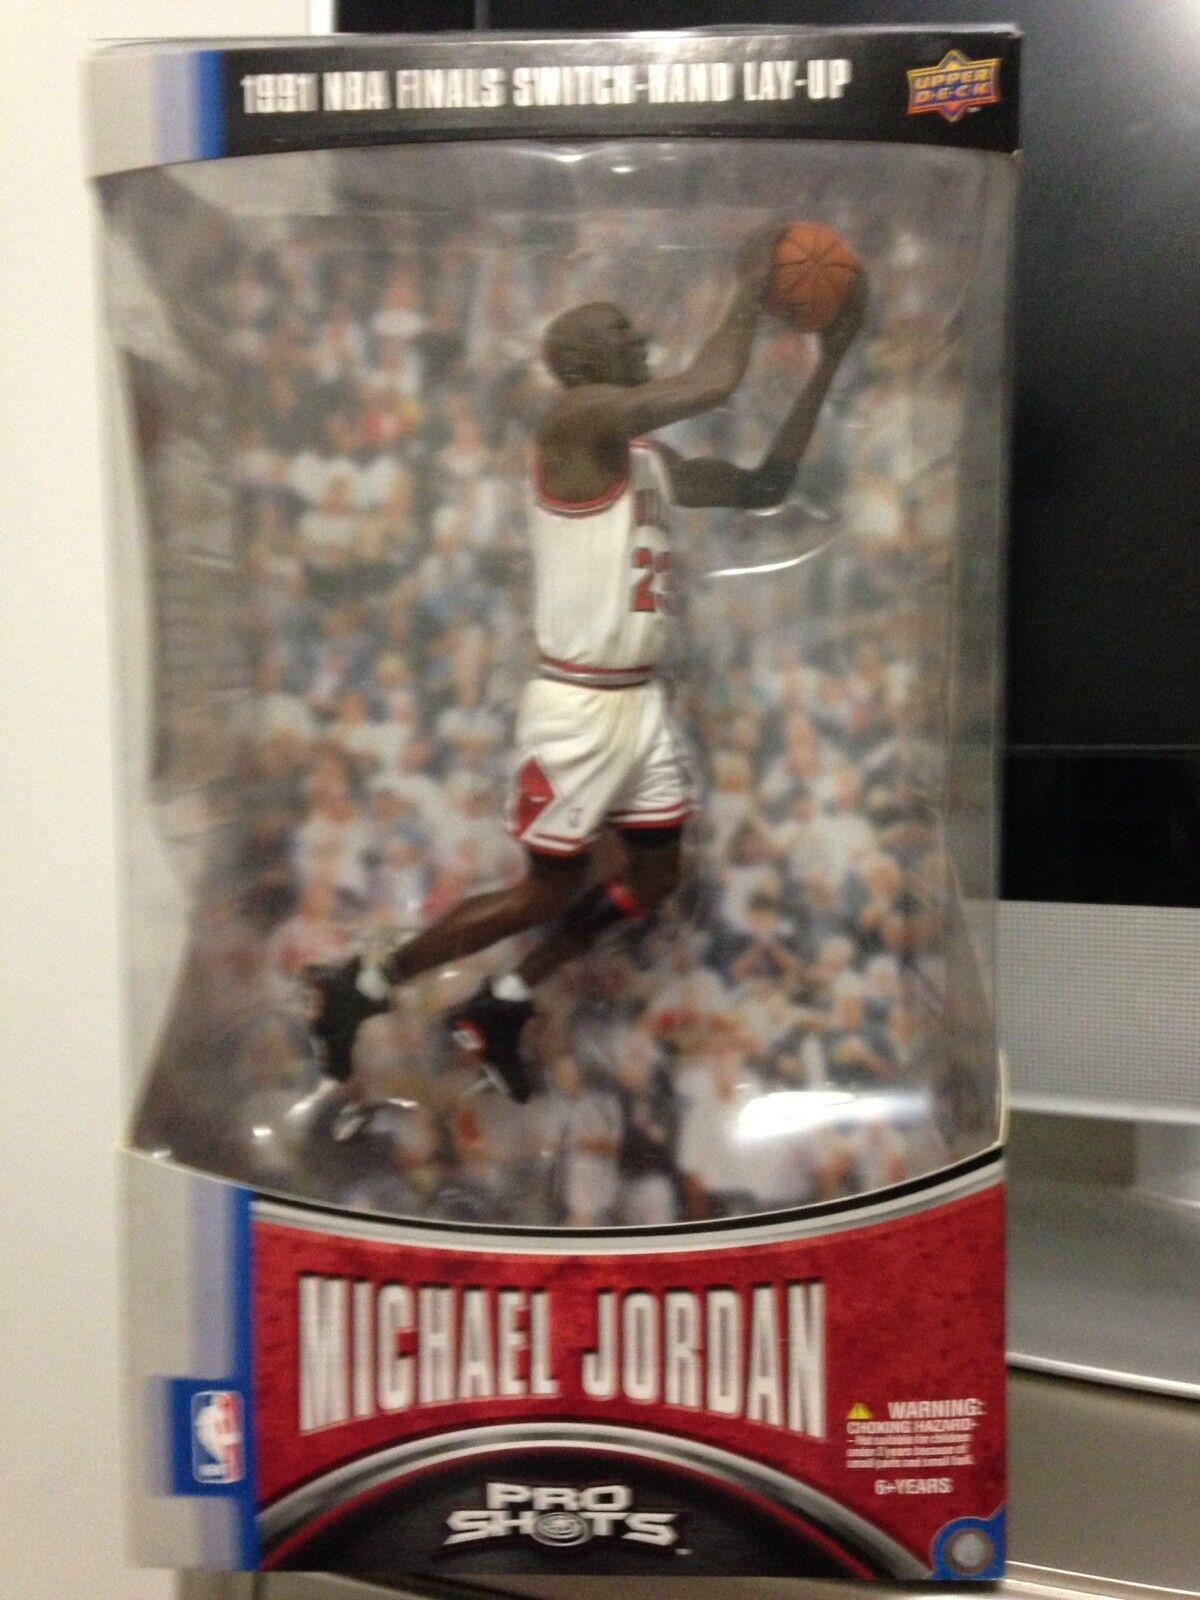 NIB M. Jordan UD Pro Shots Action Figure 1991 NBA FINALS SWITCH HAND Series 1